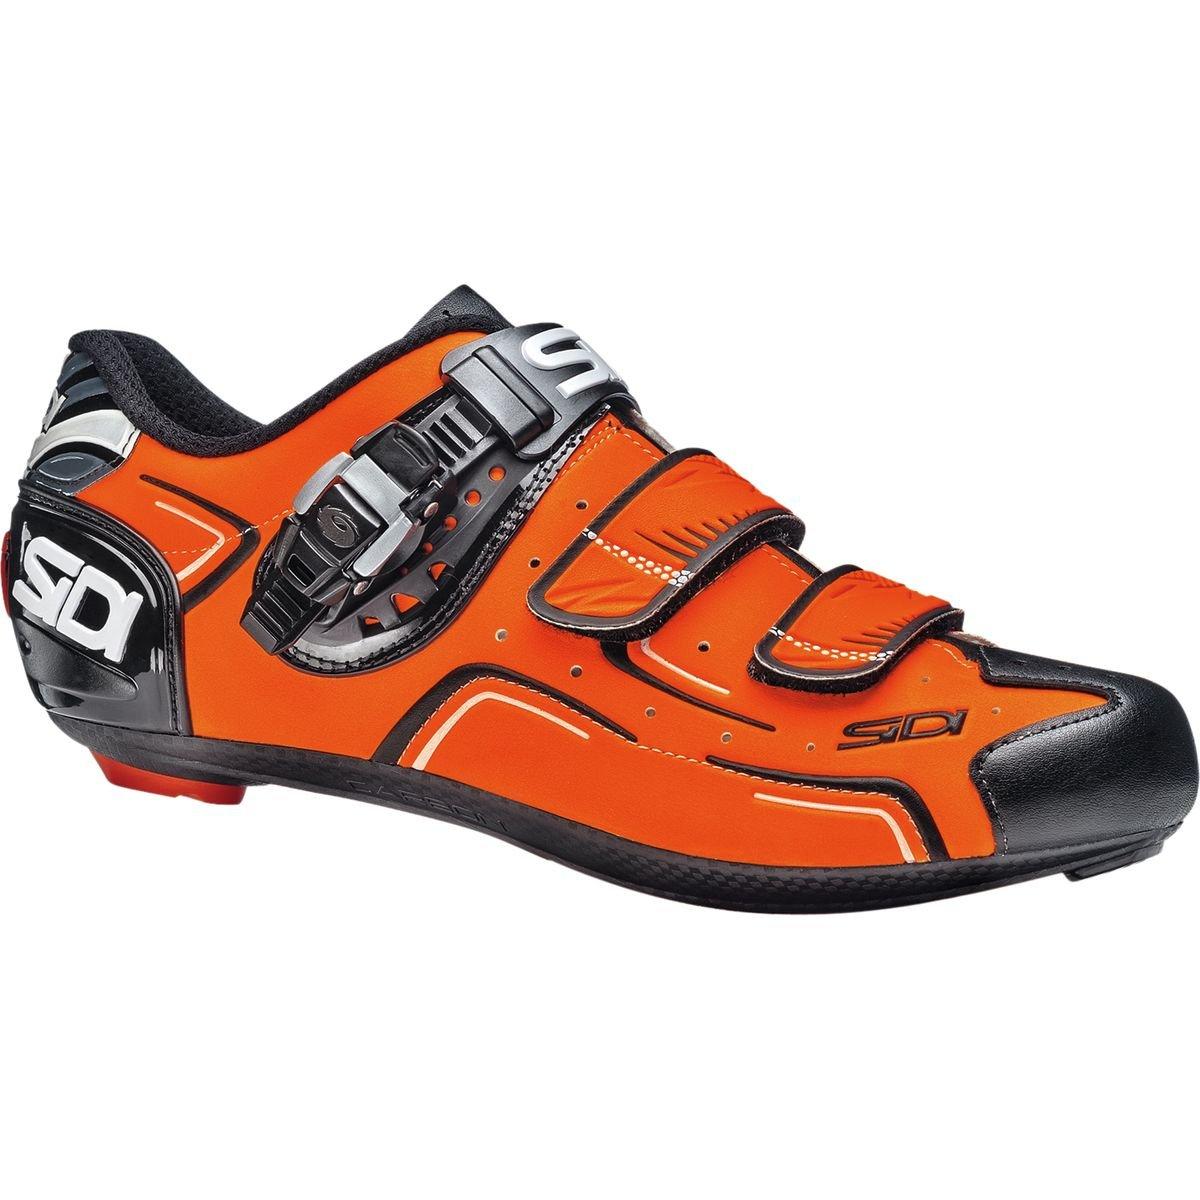 [Sidi] メンズ SRS-LVL-WHWH-390 37 EU Orange Fluo/Black B07CVP3X8P